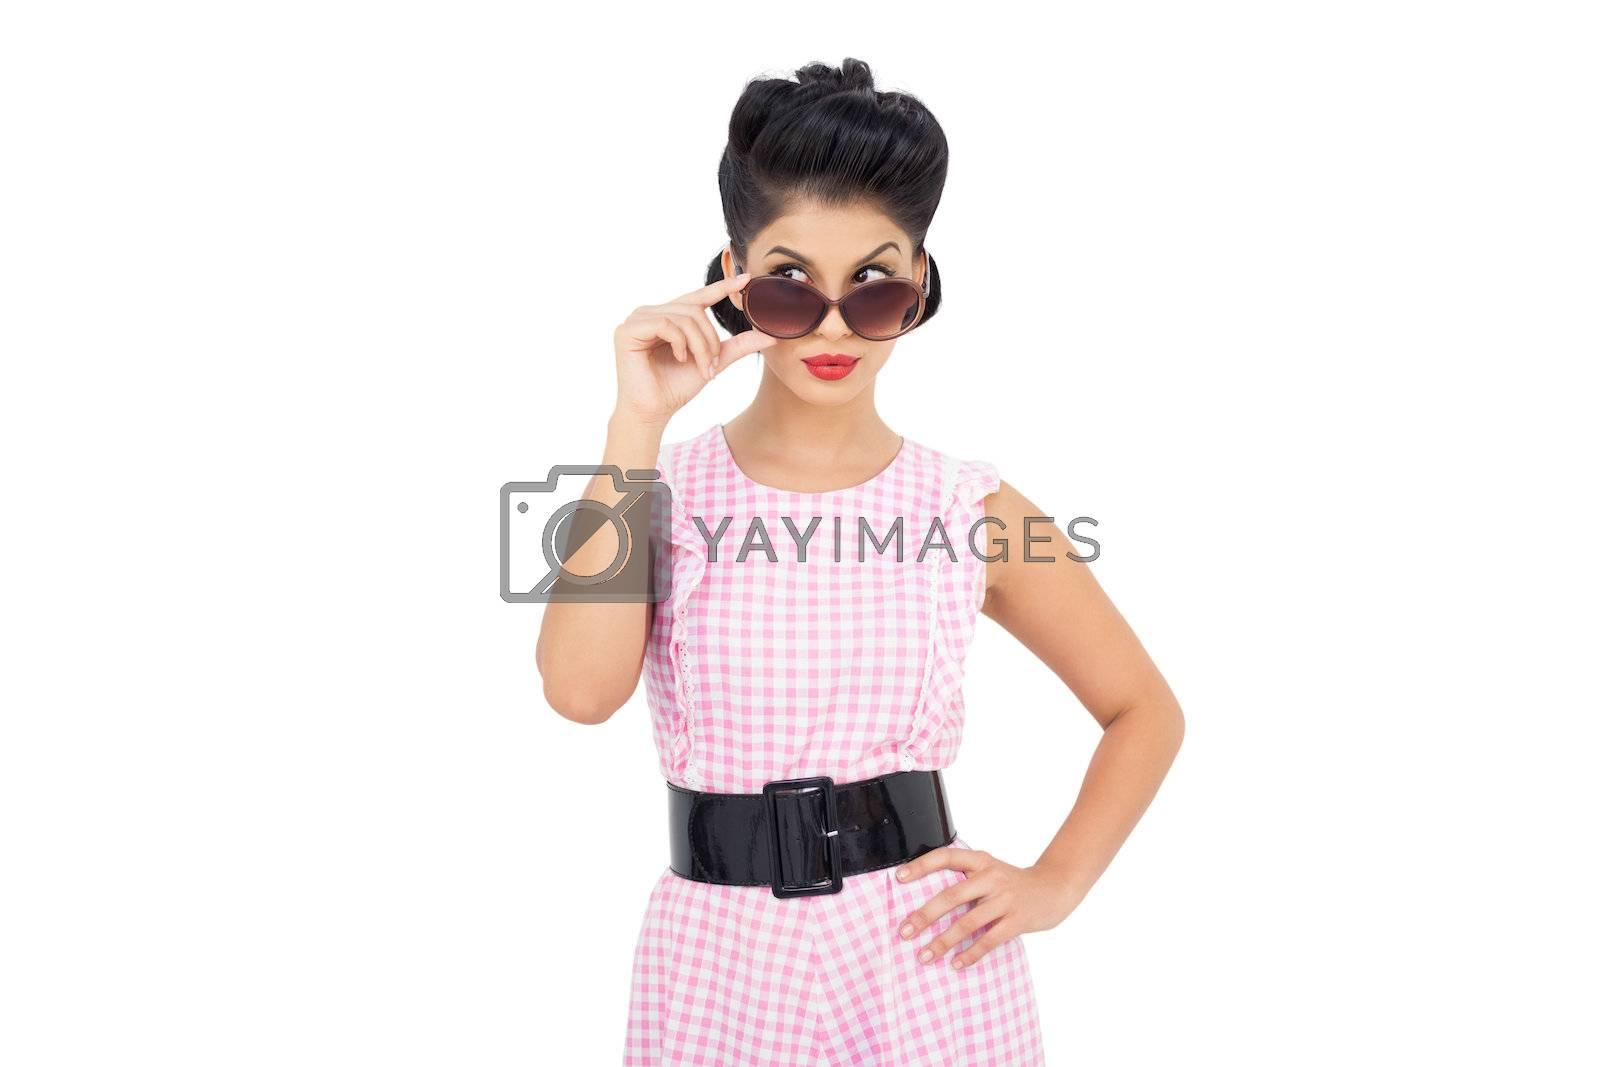 Playful black hair model looking over her sunglasses by Wavebreakmedia